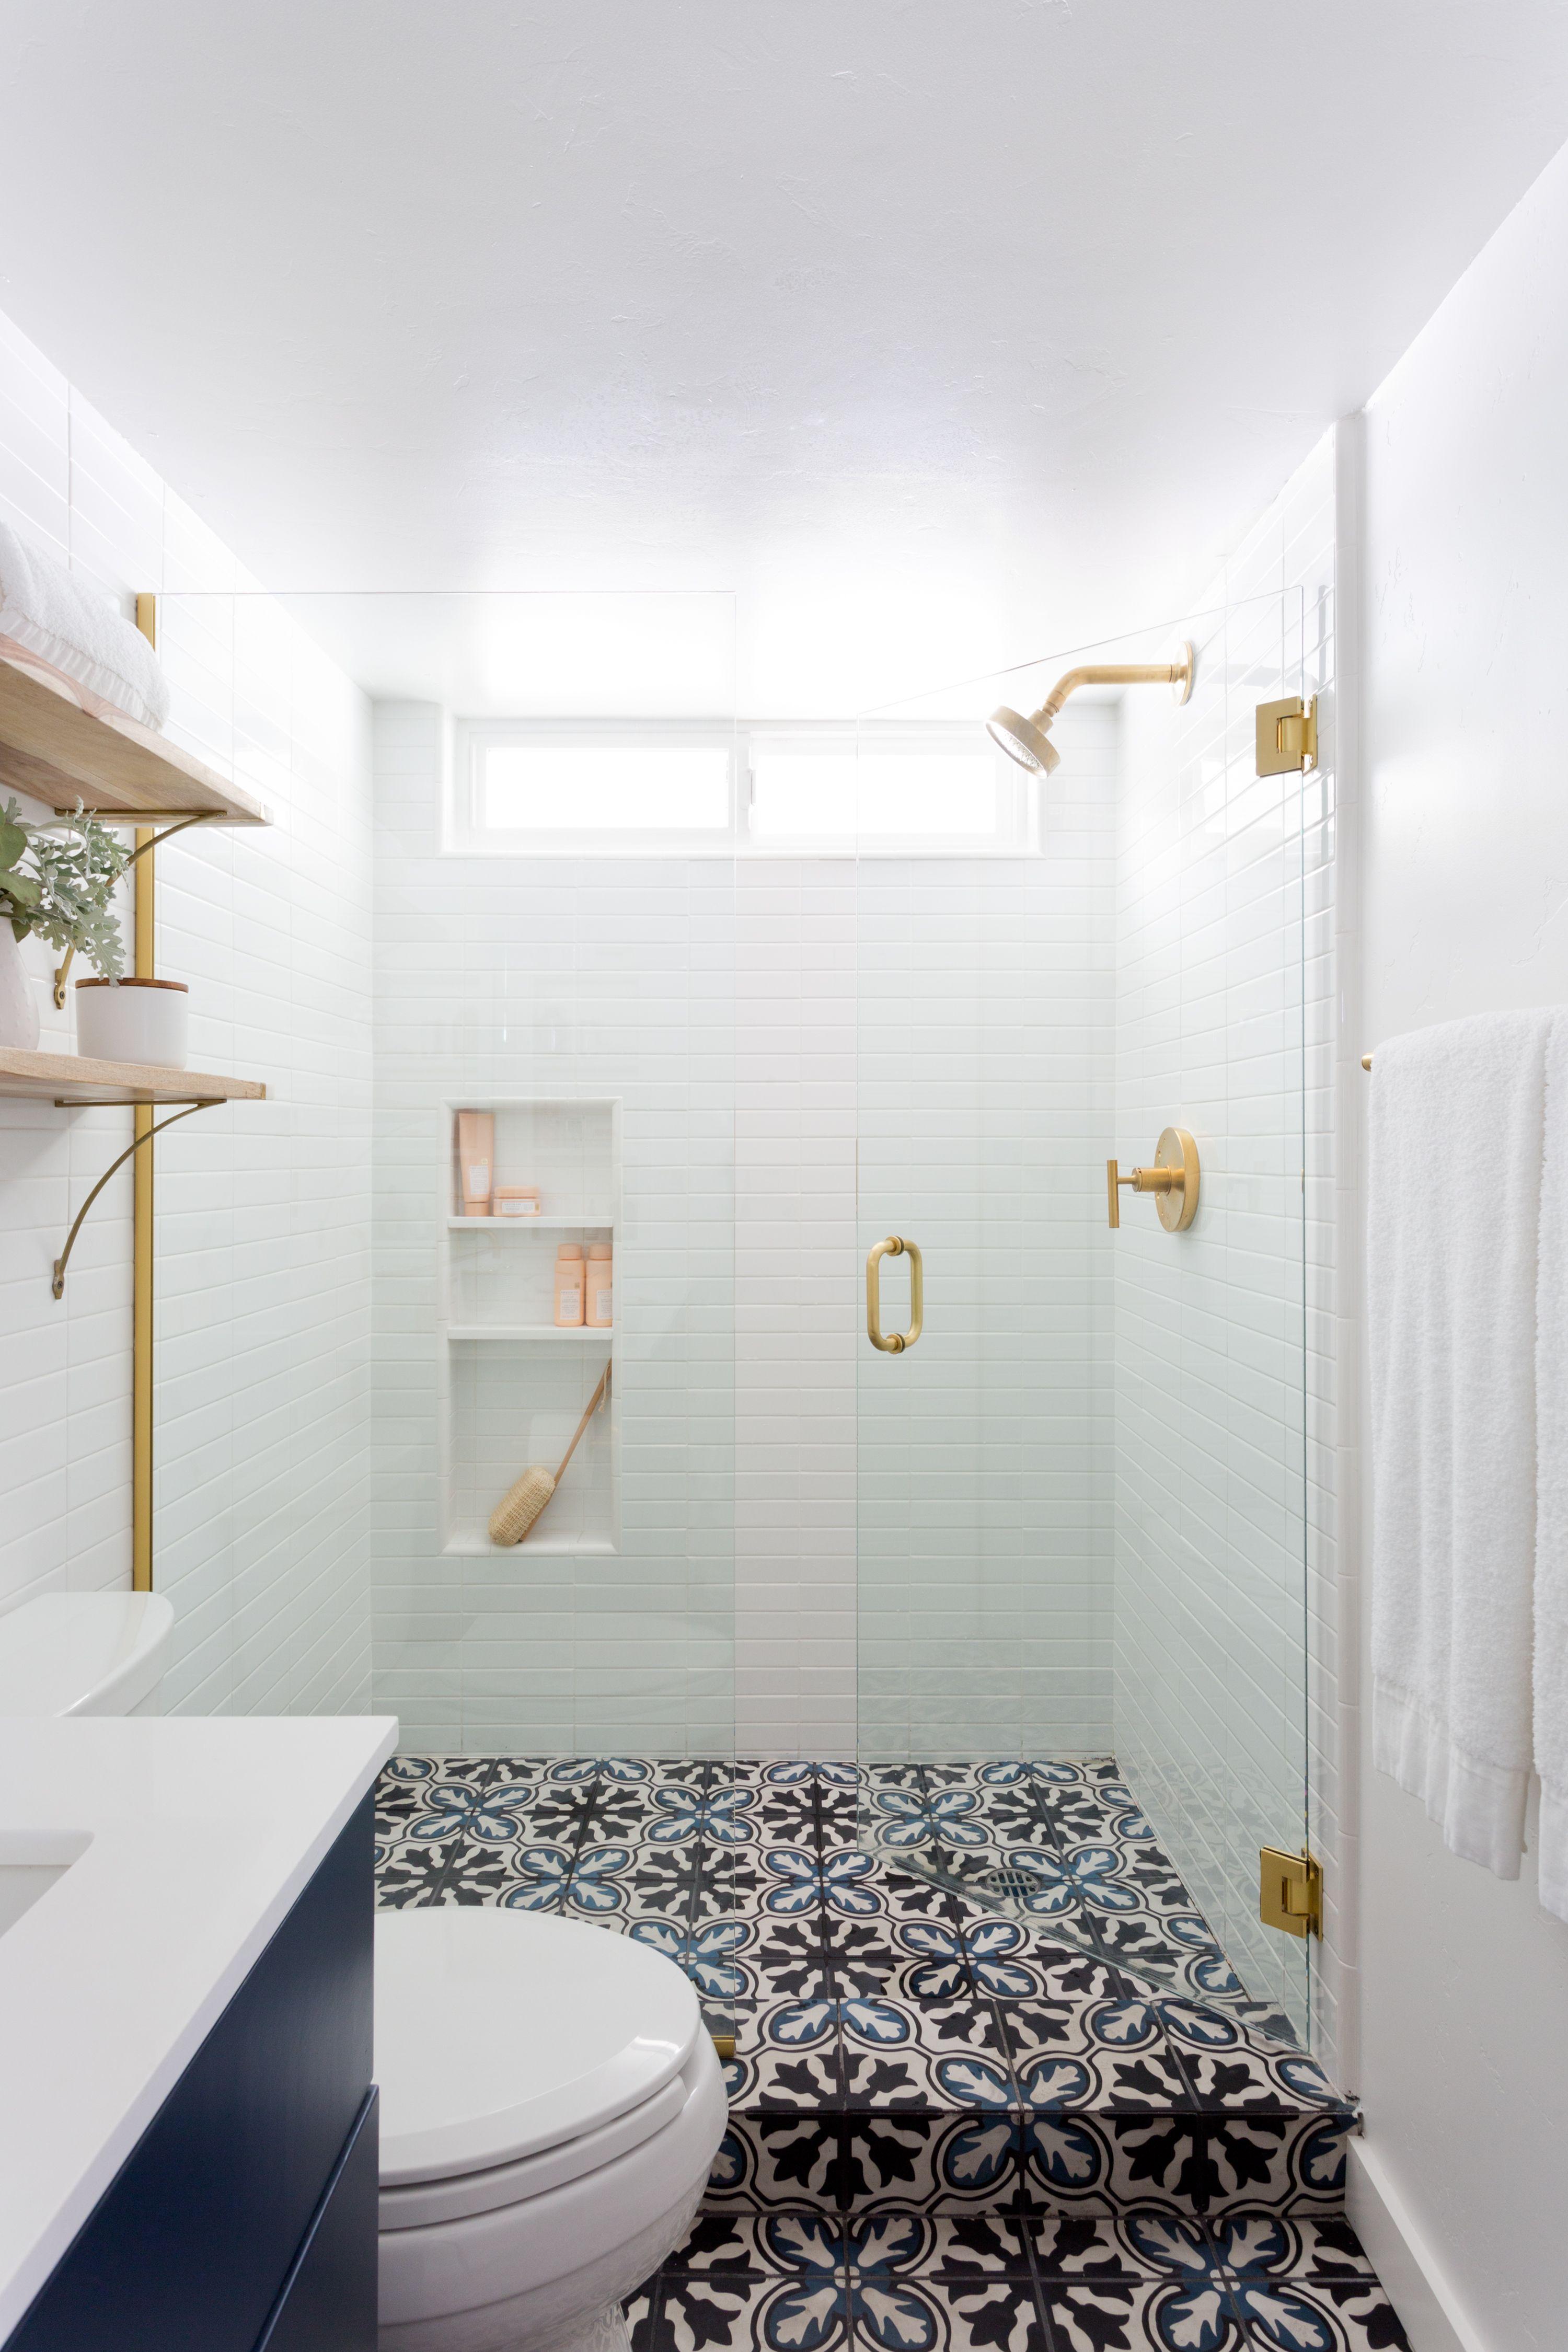 Updated Laguna Beach Home Interior Design Remodel Shower Floor Tile Bathroom Design Bathroom Floor Tiles